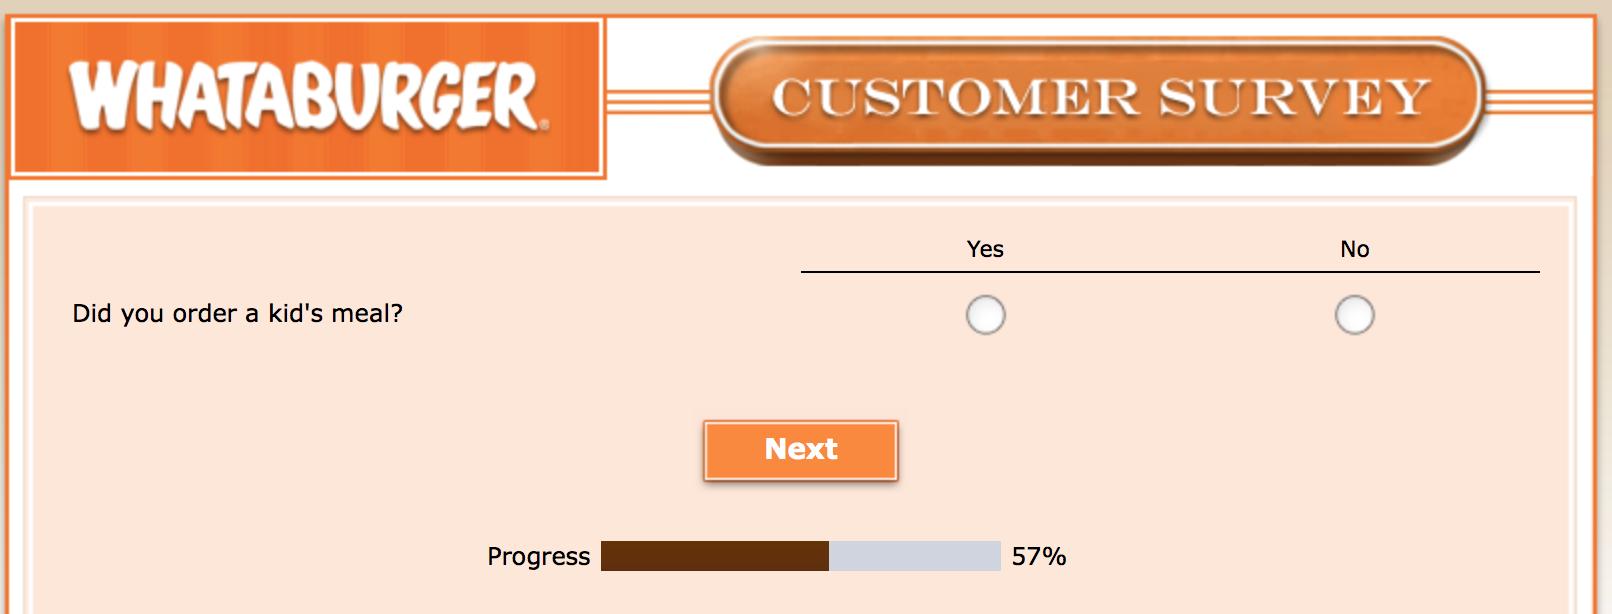 Whataburger Survey 19